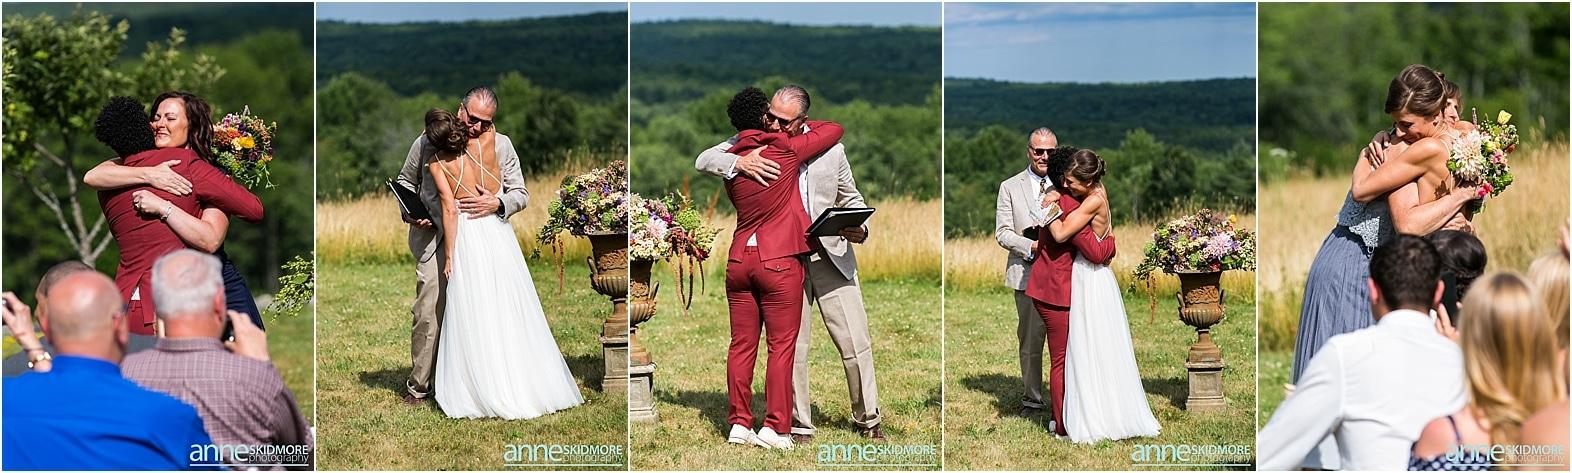 Maine_Barn_Wedding_0031